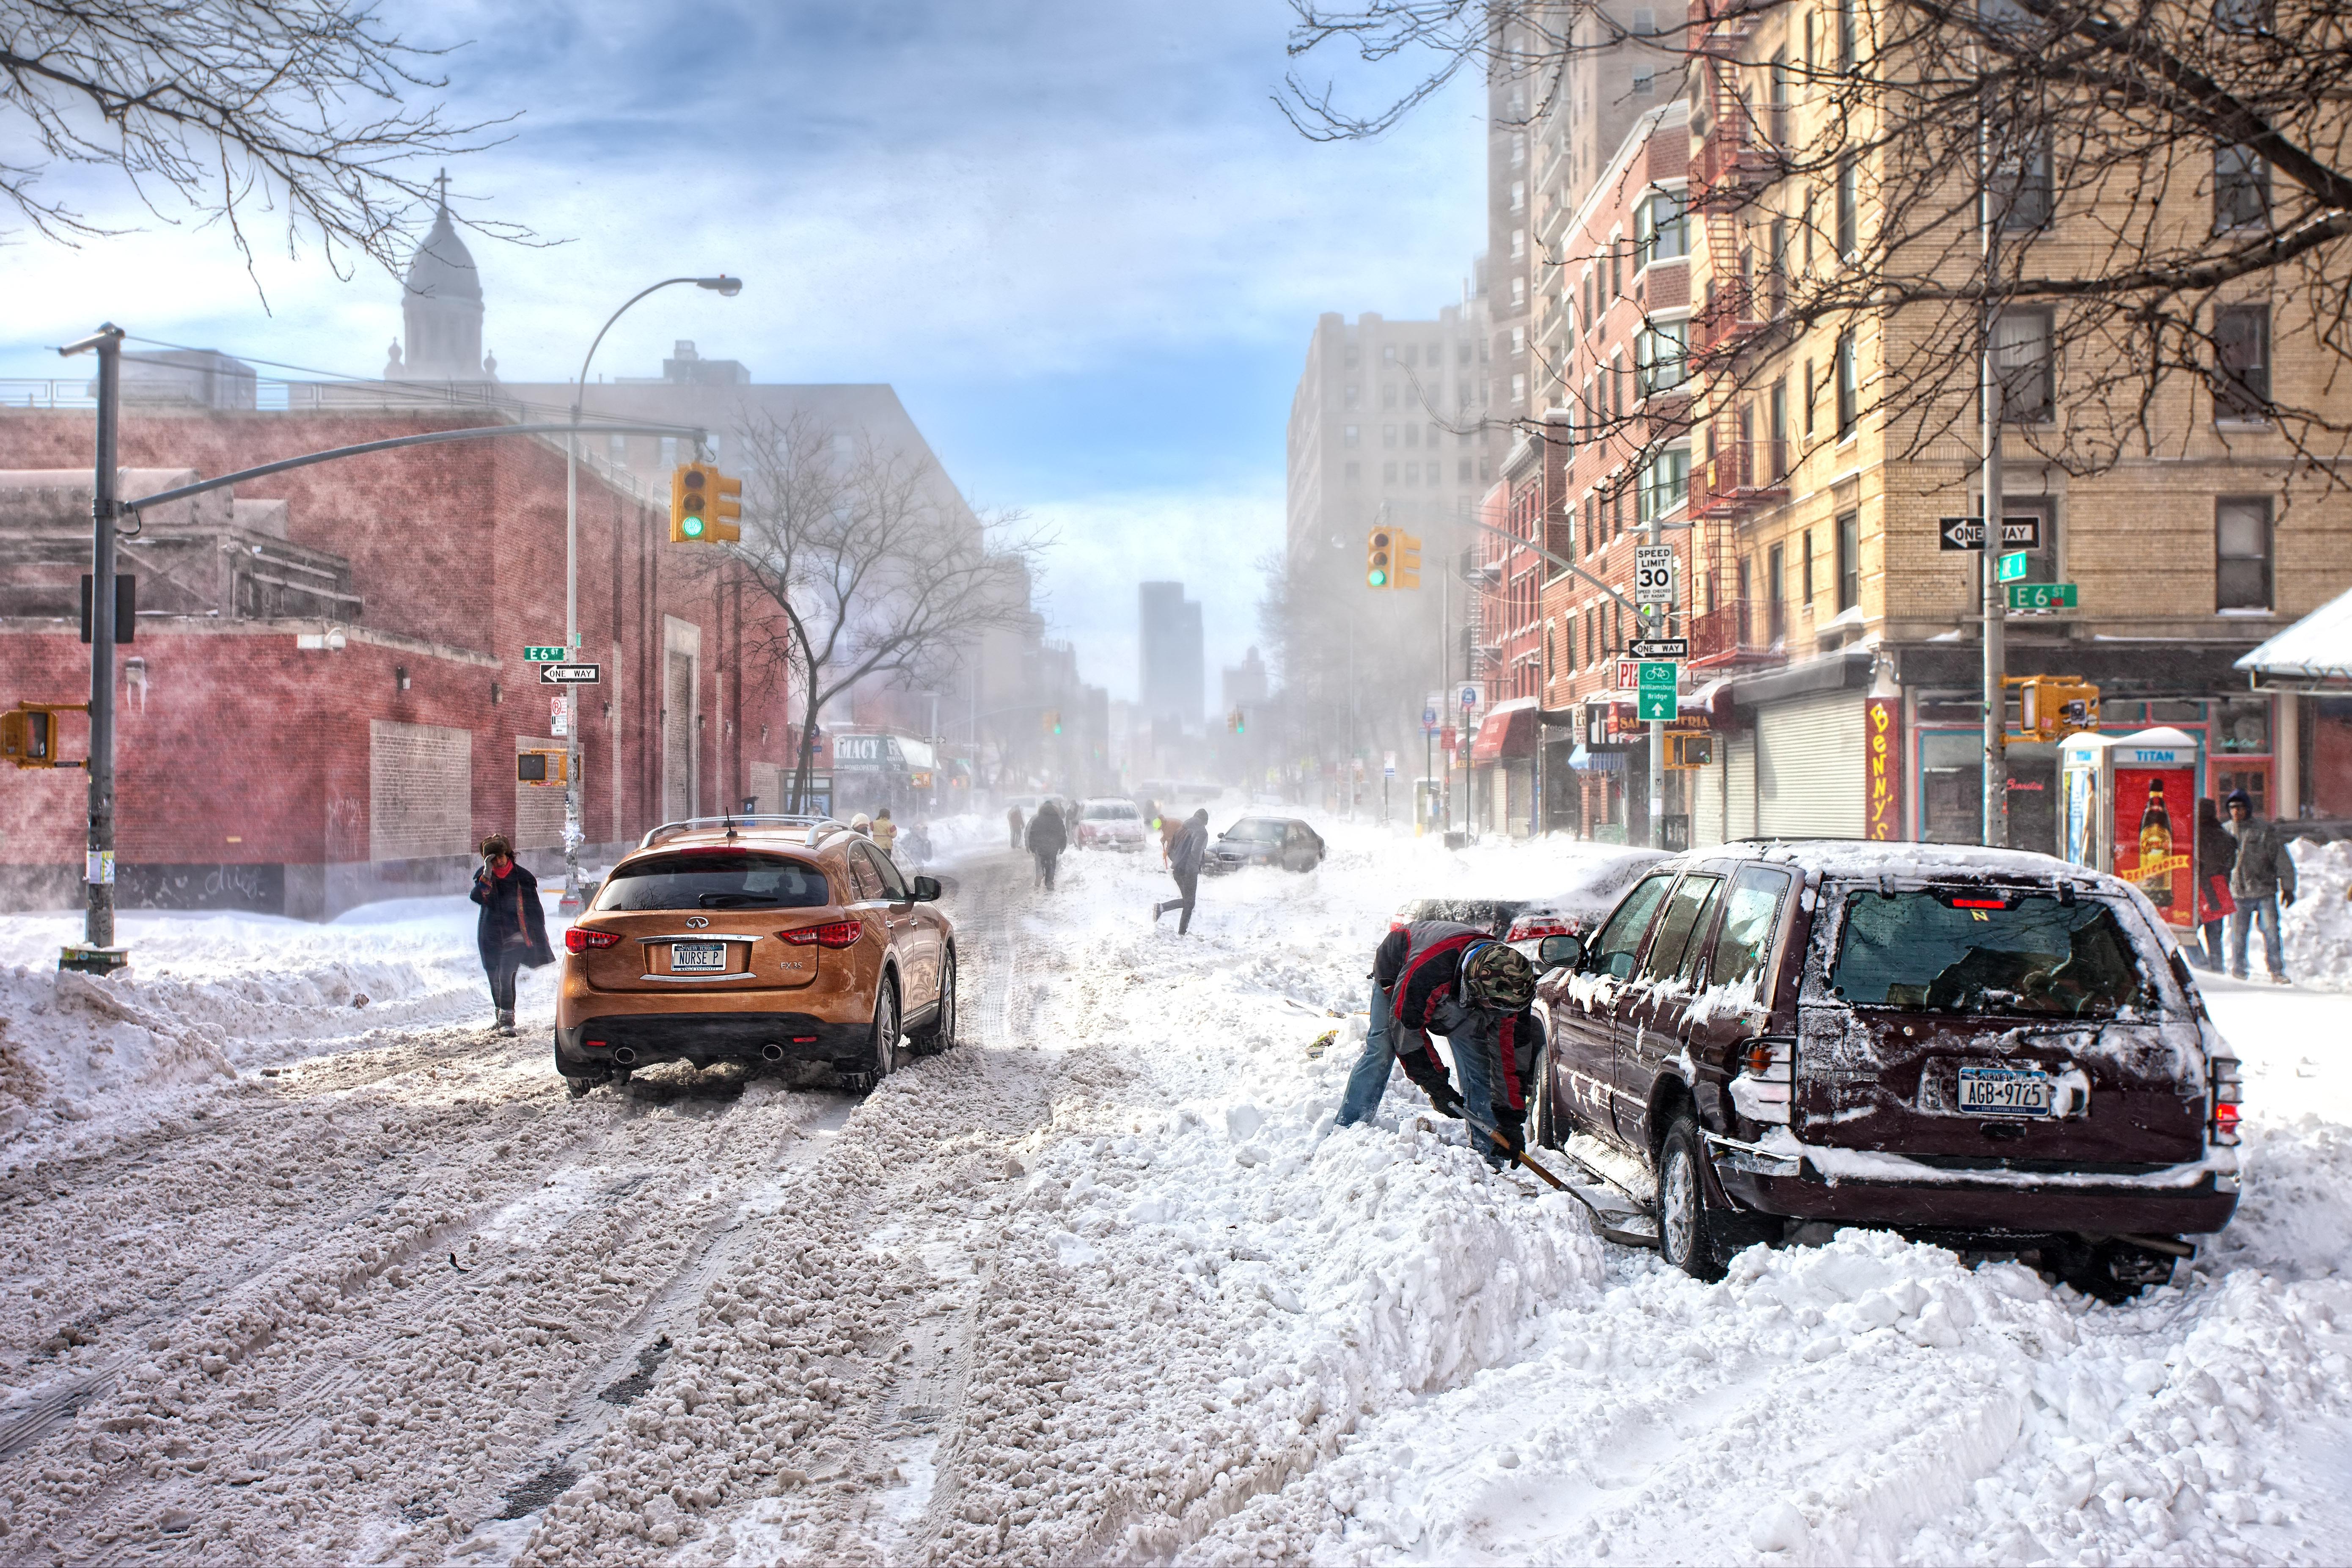 Bad weather snow winter new york new york snow infinity 5559x3706